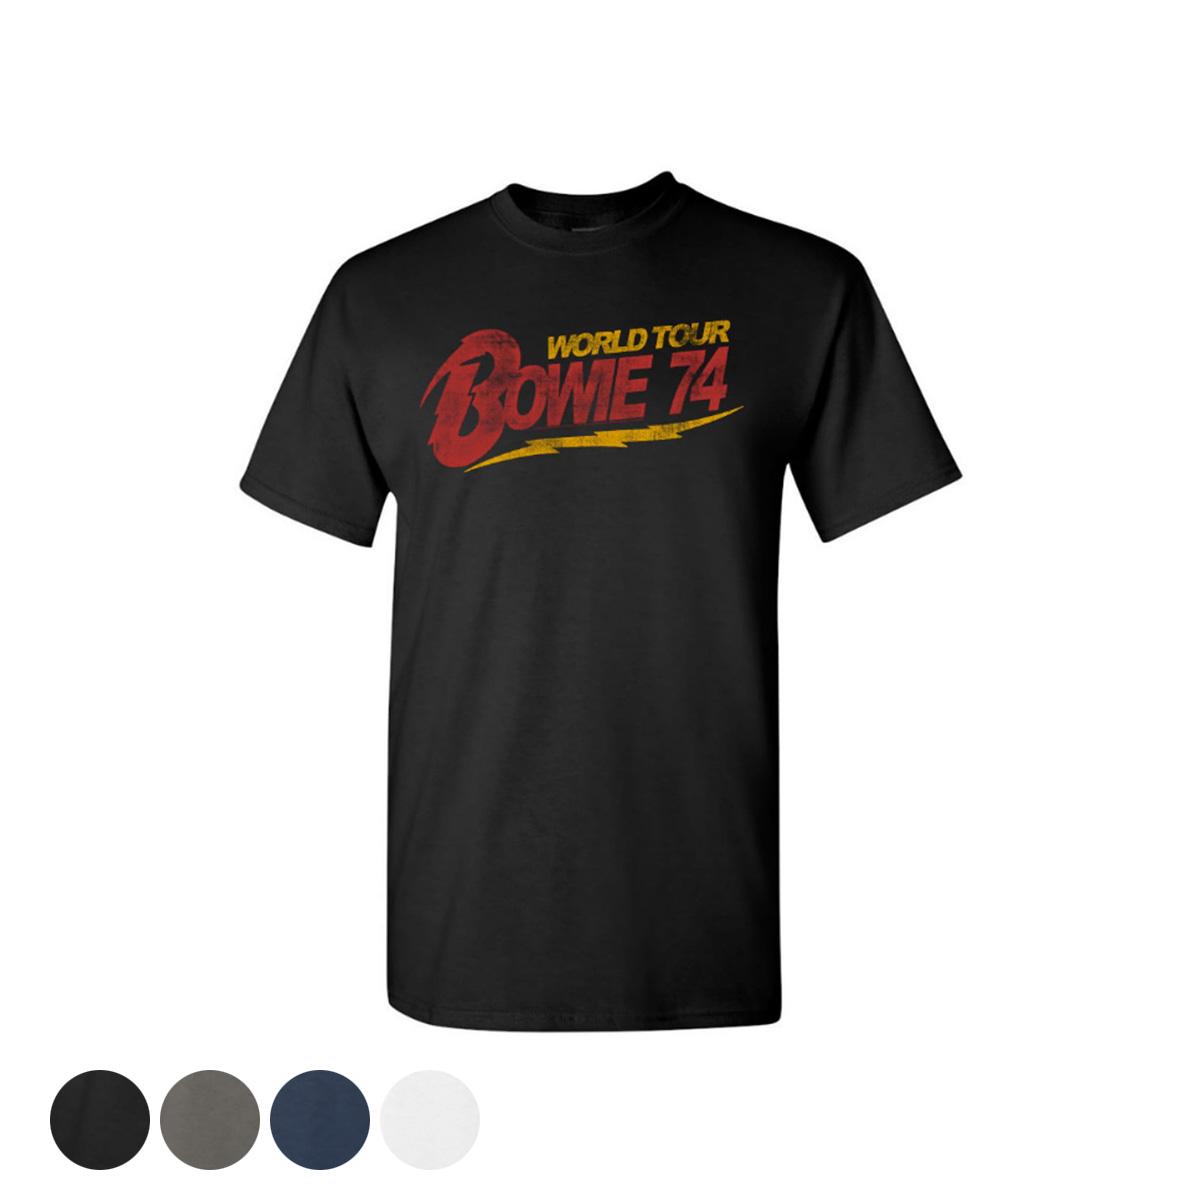 Retro '74 T-Shirt